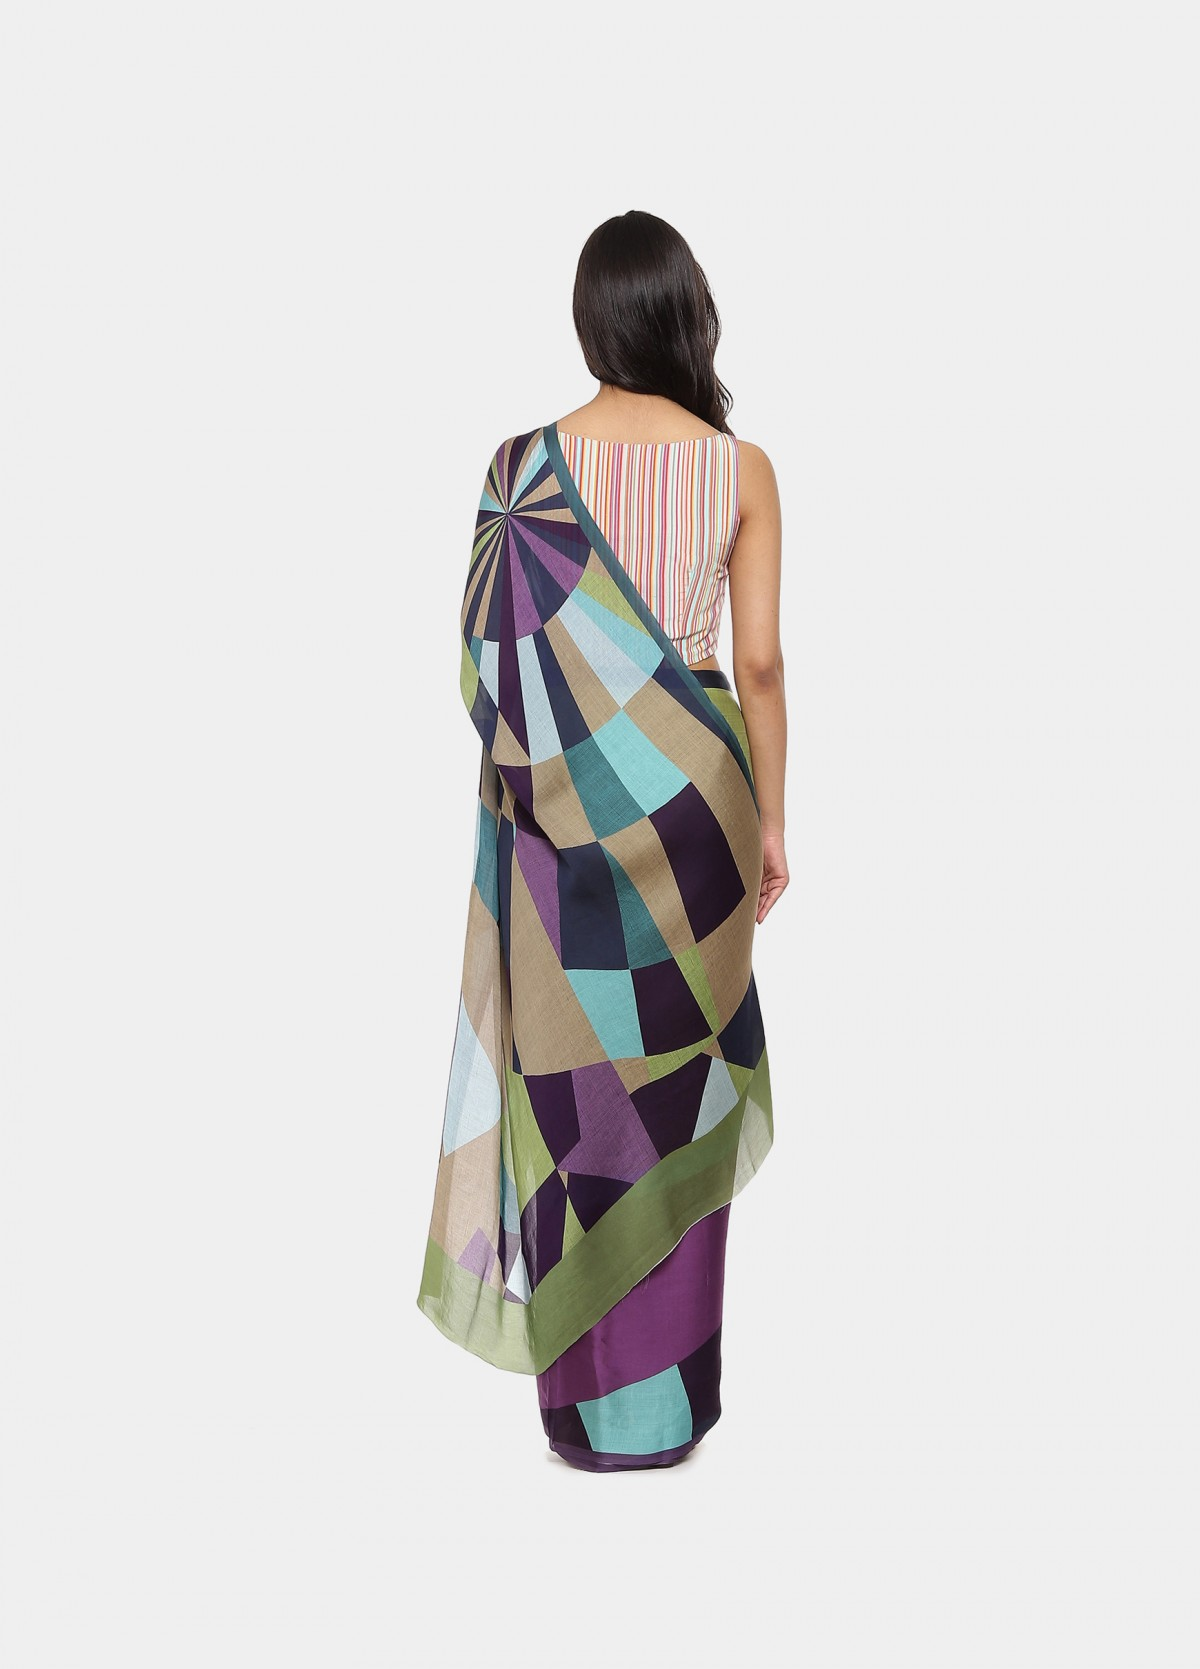 The Prism Sari